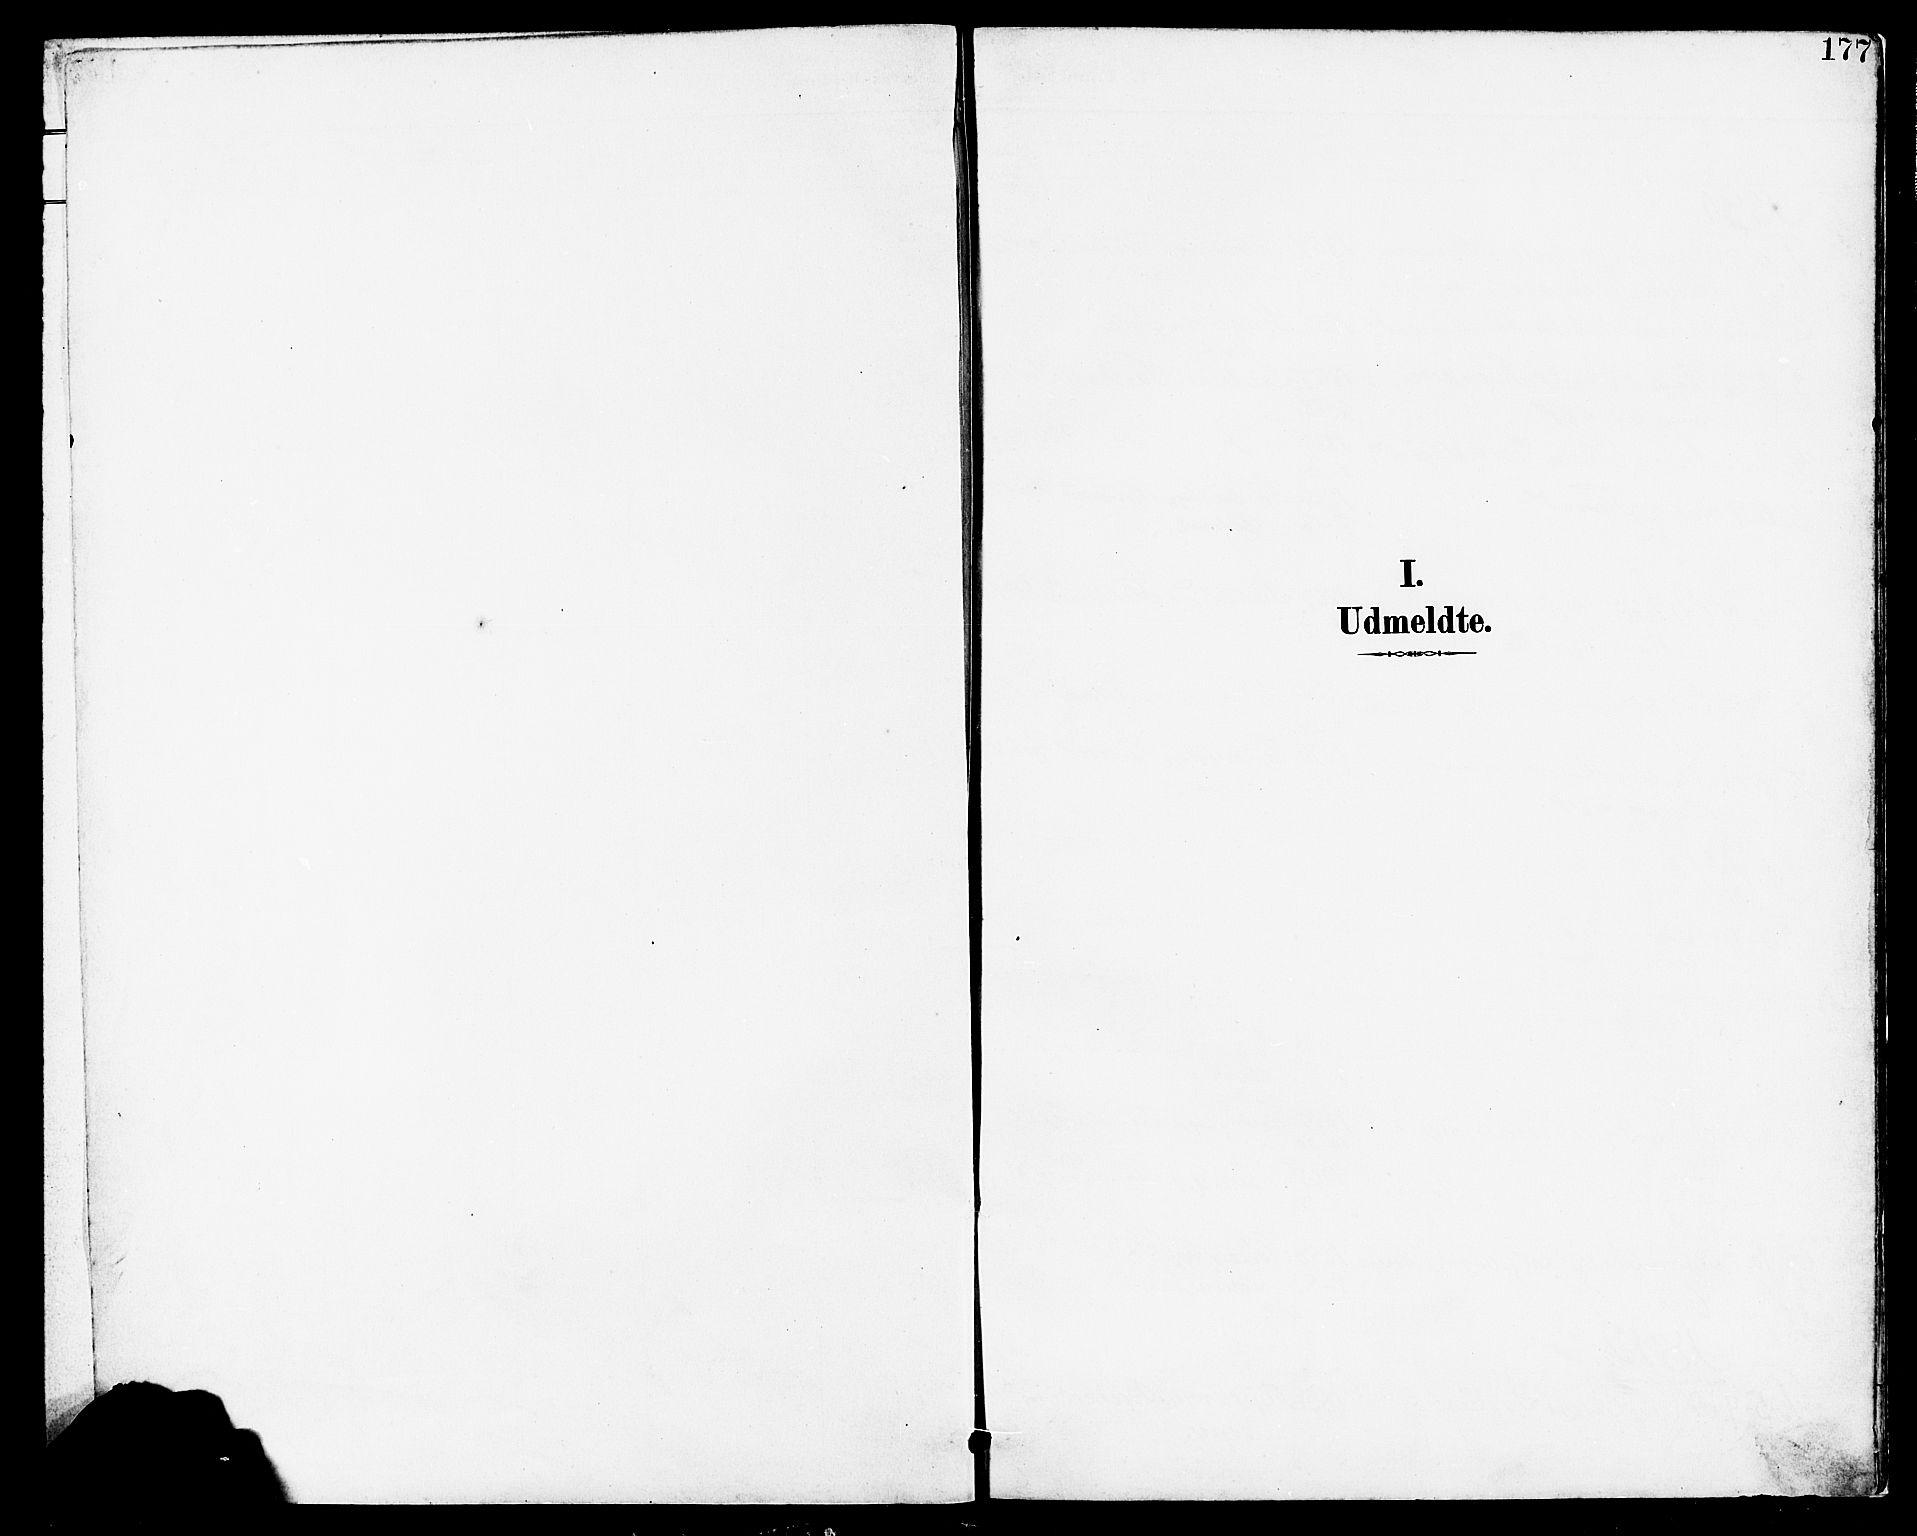 SAST, Høyland sokneprestkontor, 30BA/L0014: Ministerialbok nr. A 12, 1890-1898, s. 177